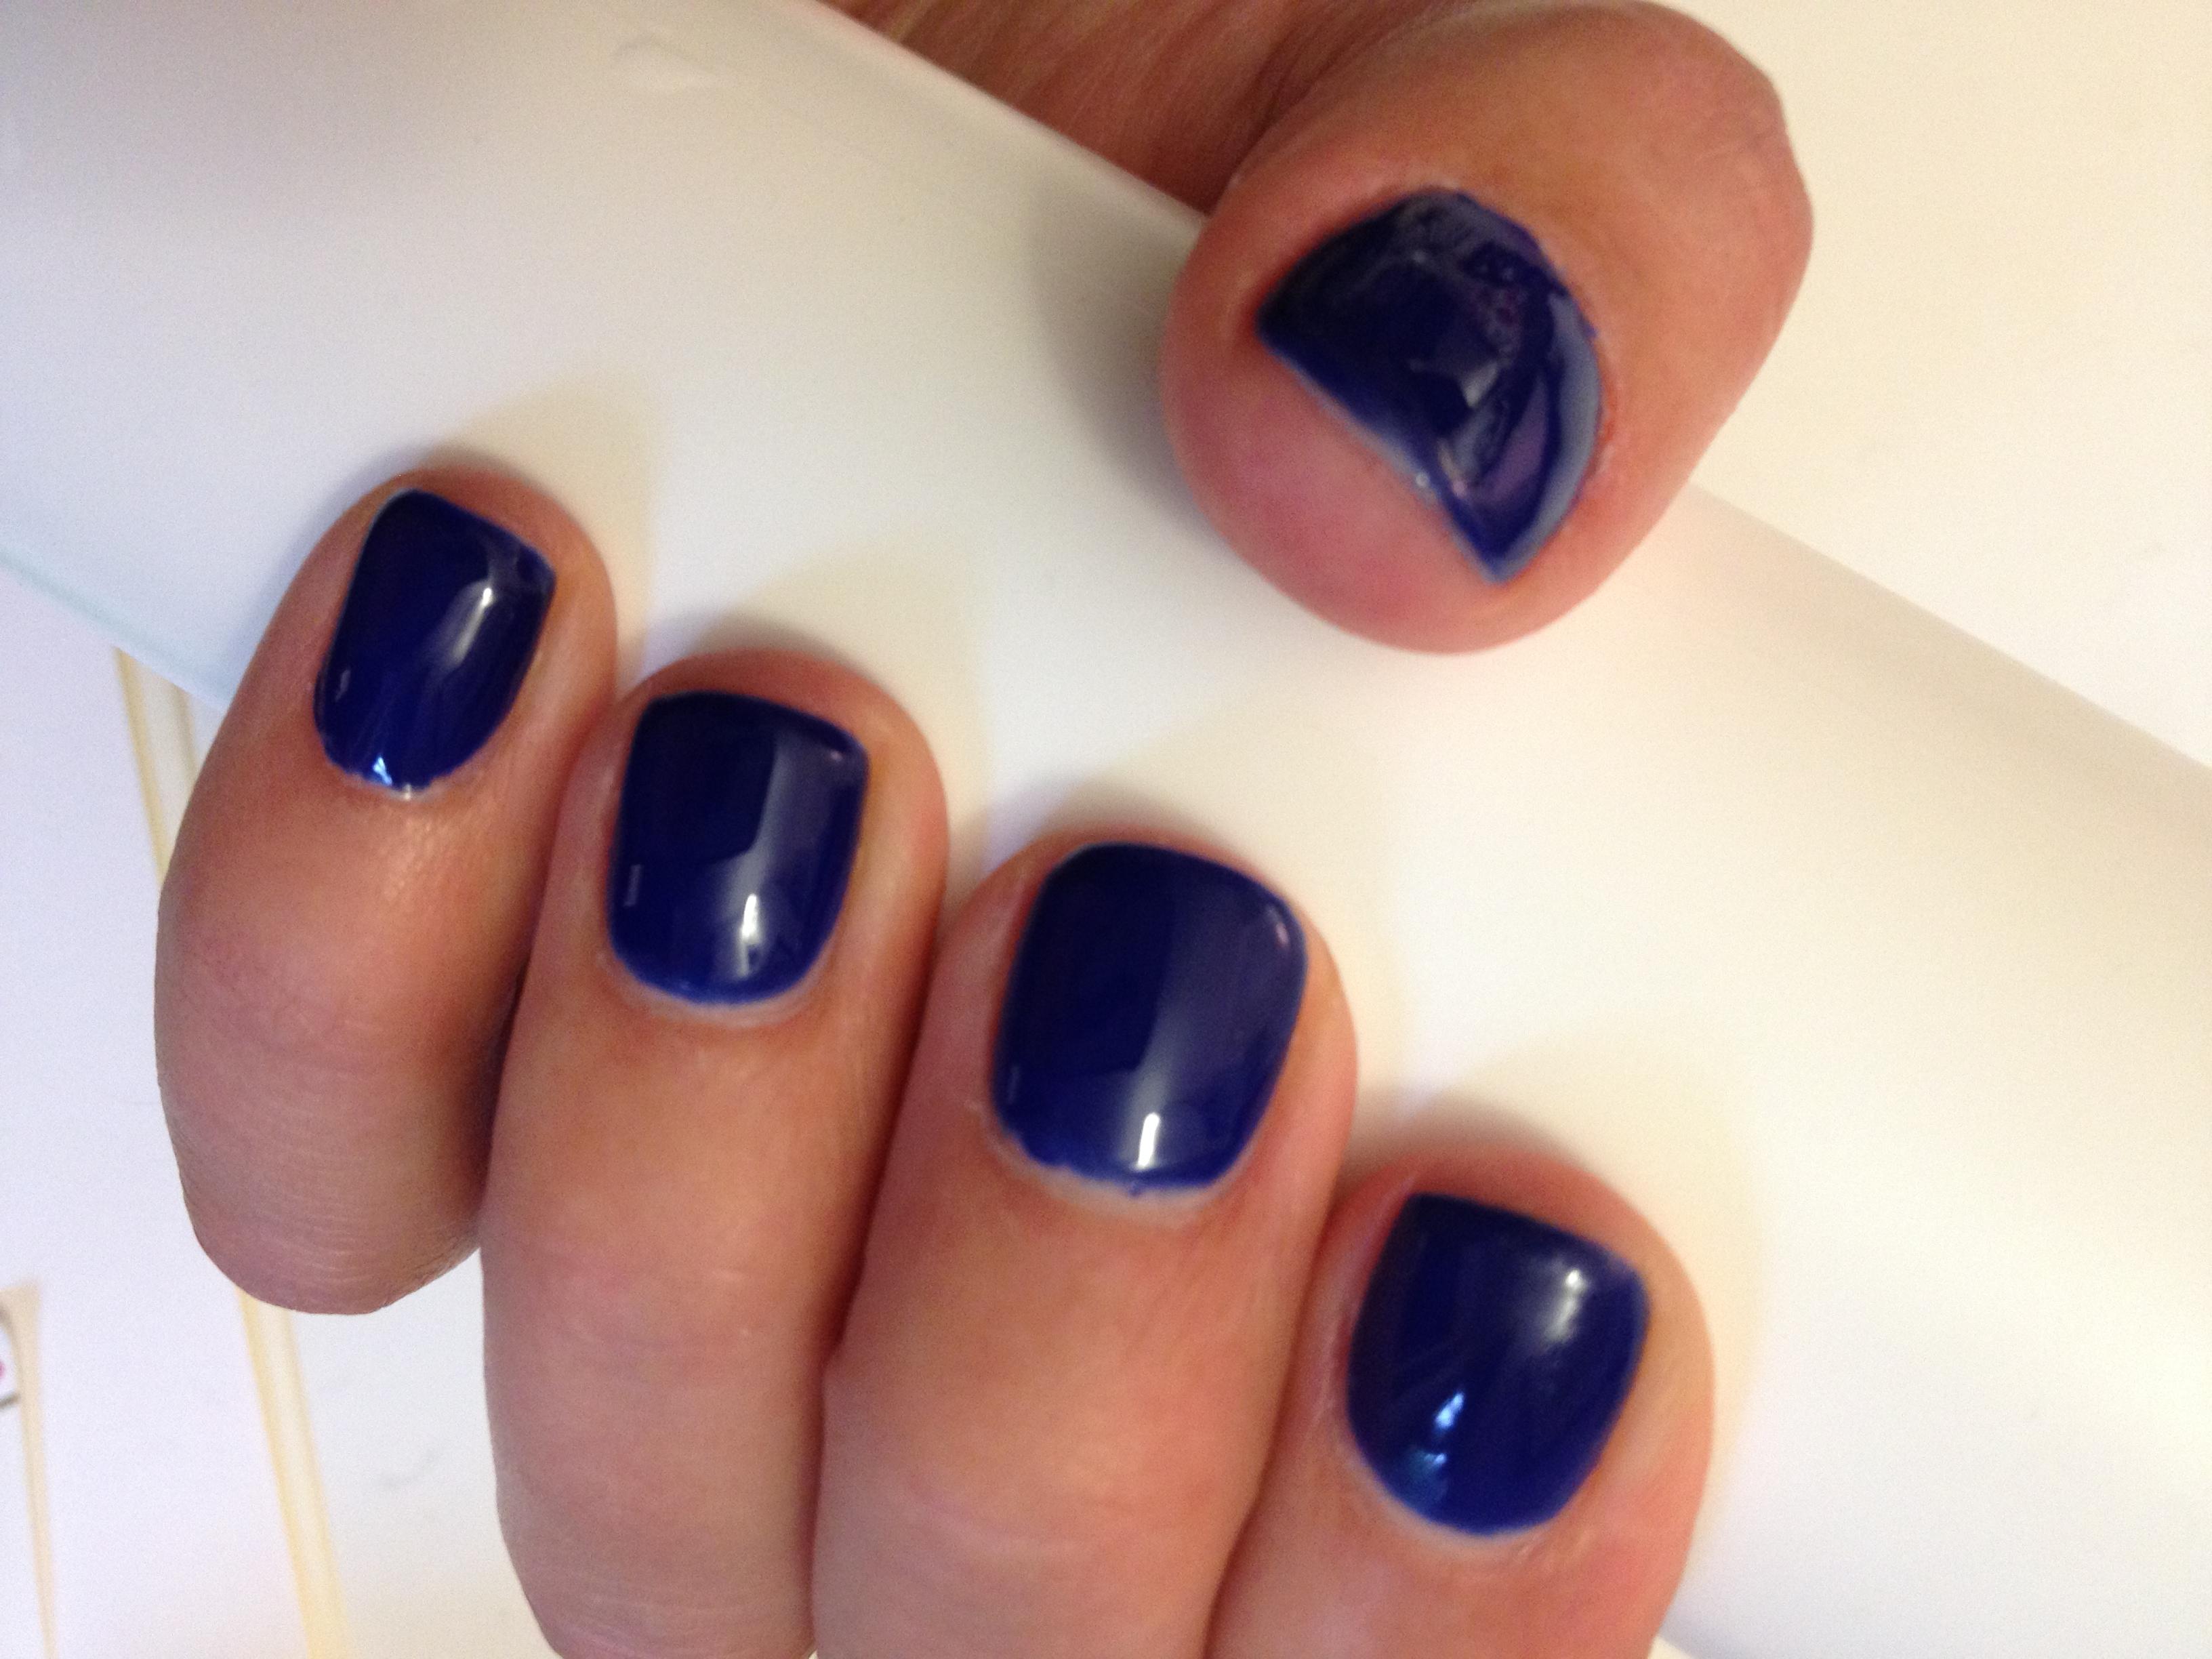 Nail Polish Blues Blue Gel Nail Polish Image